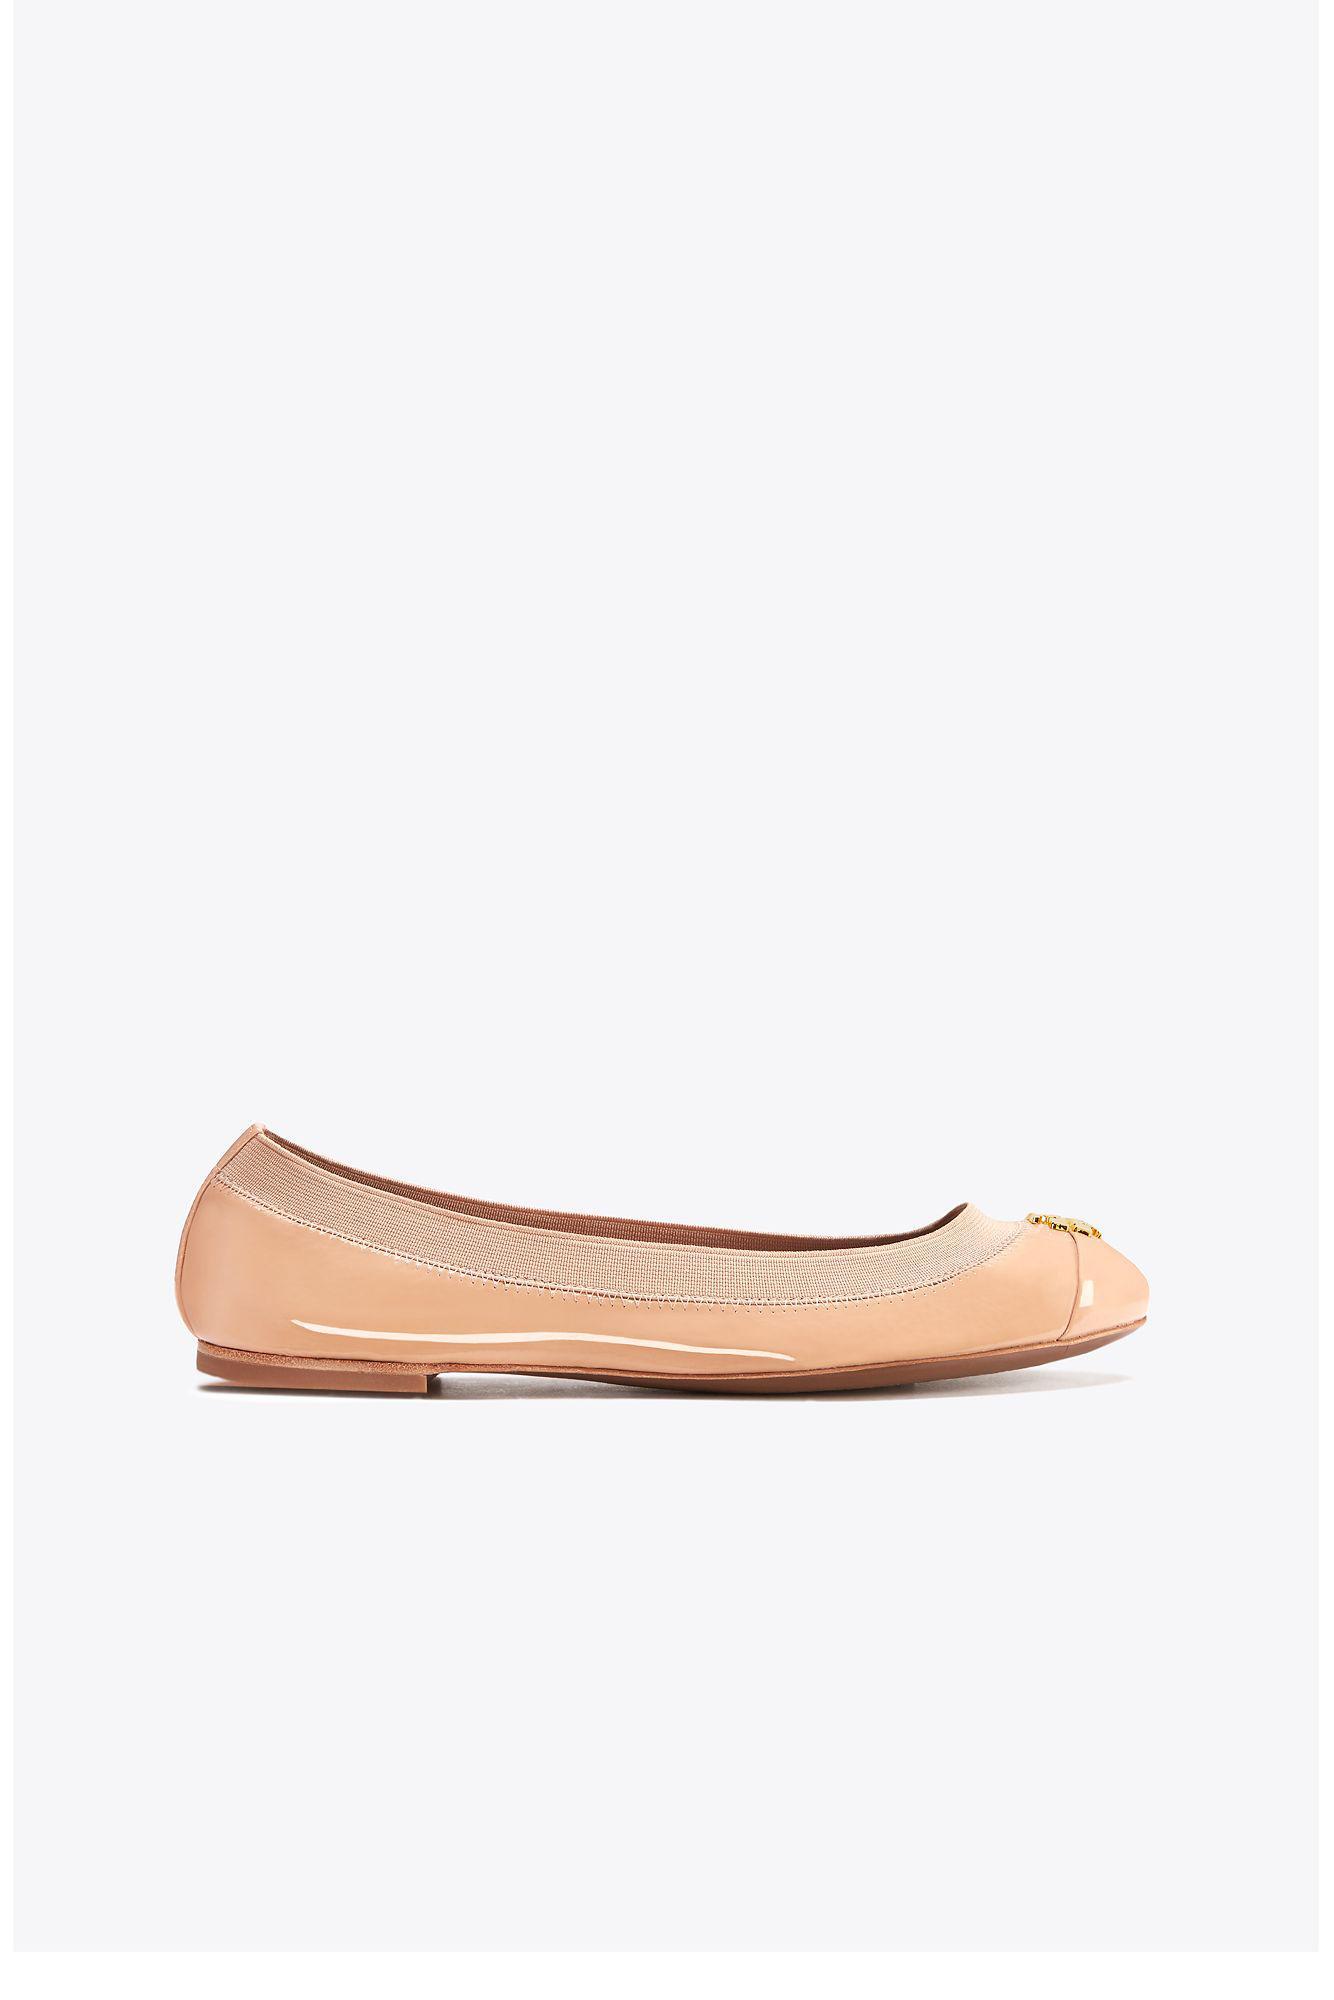 65aa349cb81 Lyst - Tory Burch Jolie Patent Ballet Flat in Gray